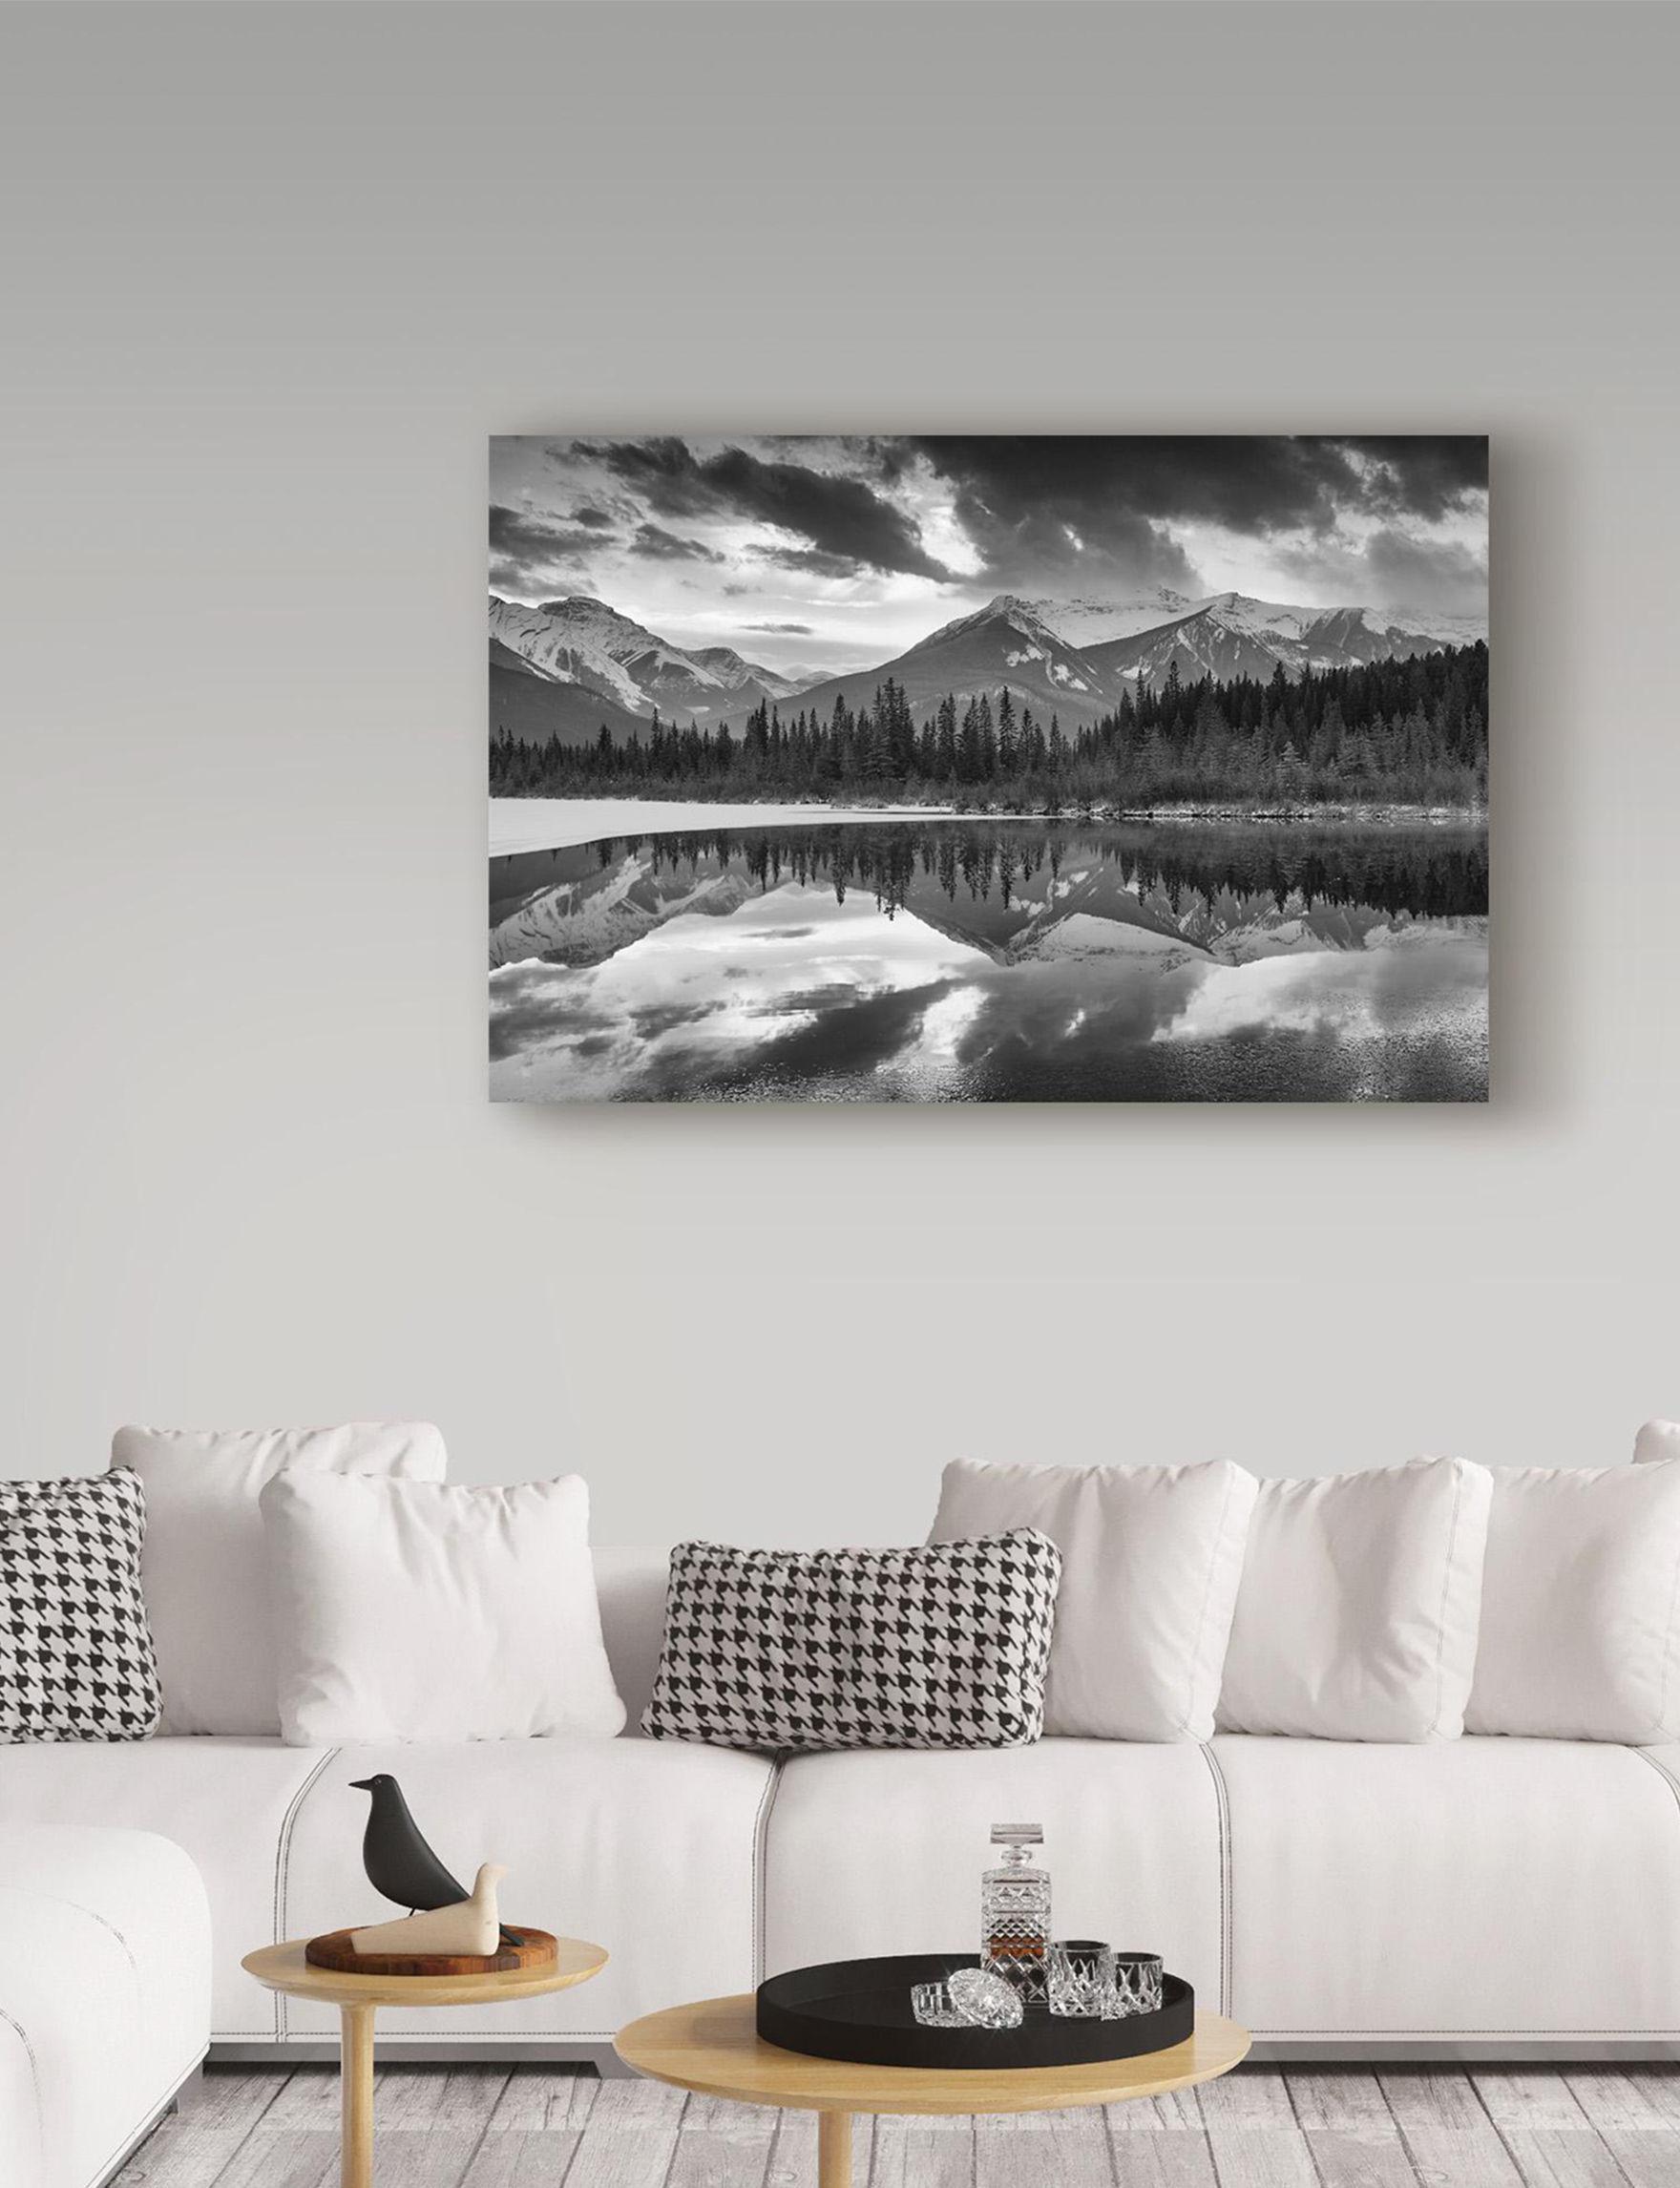 Trademark Fine Art Black / White Wall Art Home Accents Wall Decor